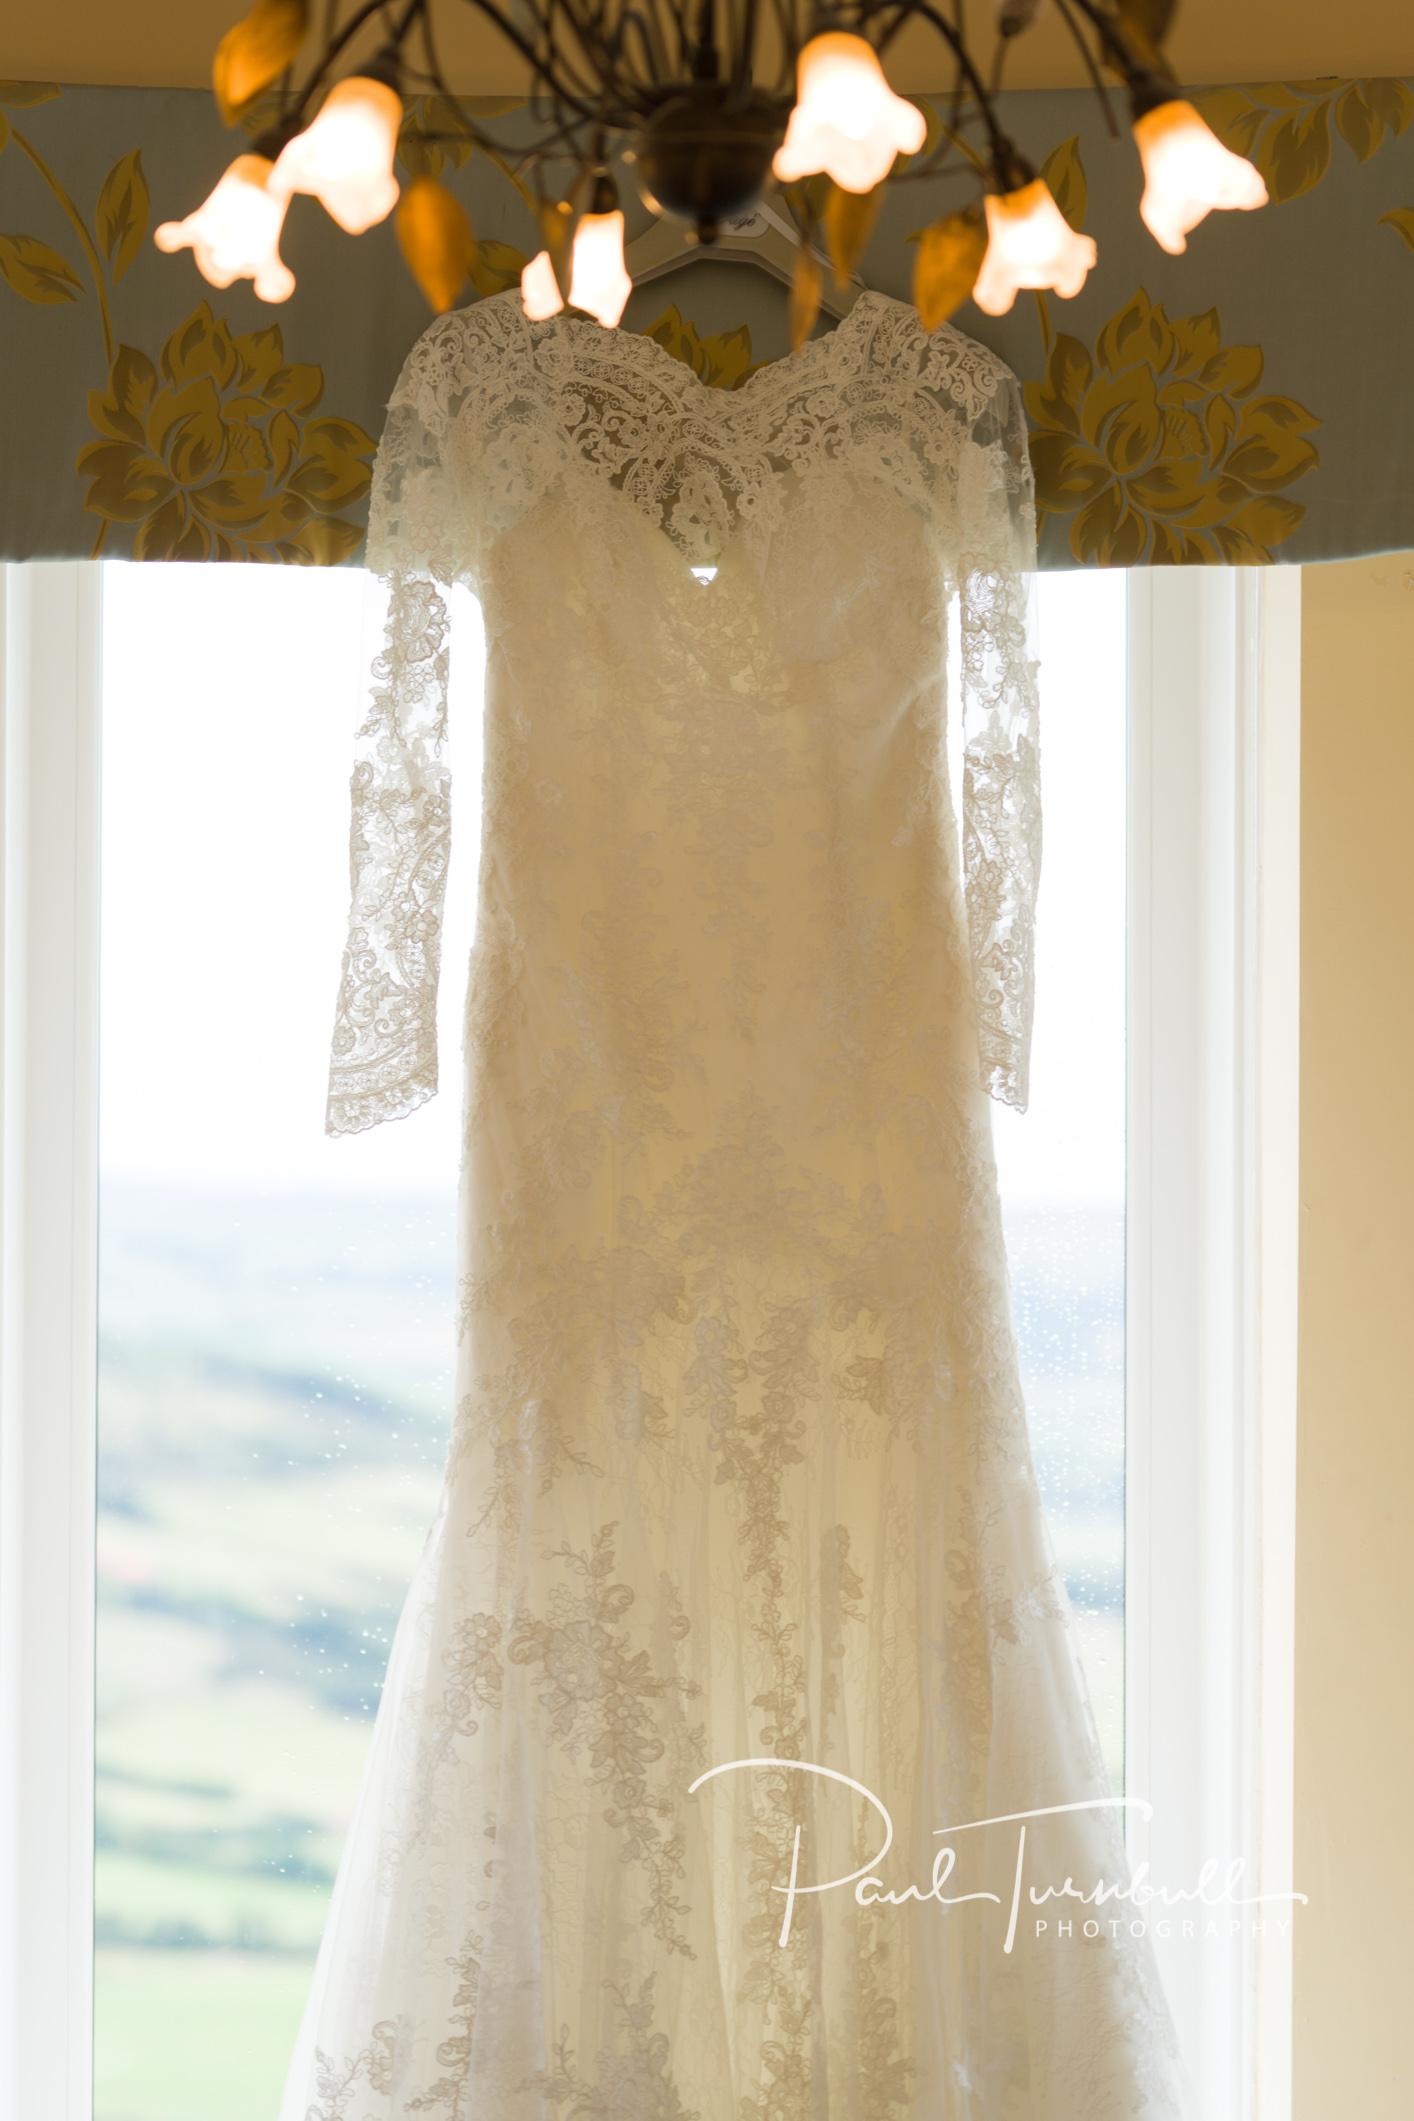 wedding-photographer-raven-hall-ravenscroft--scarborough-yorkshire-lucy-ryan-006.jpg